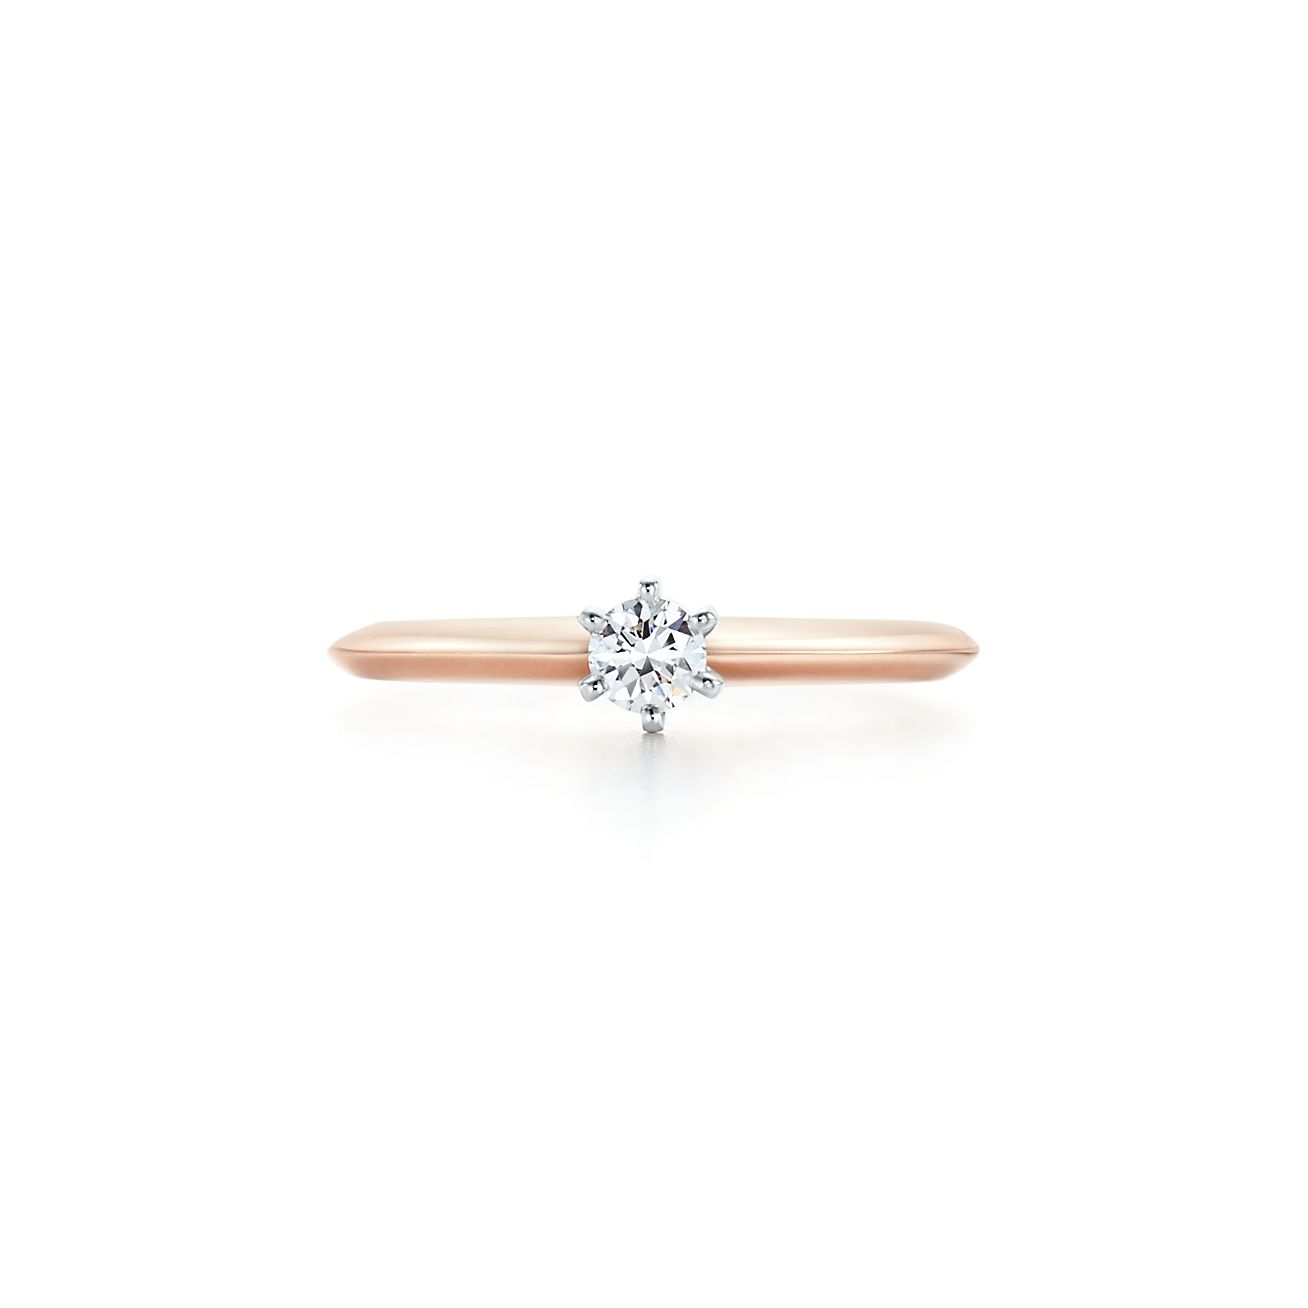 The Tiffany Setting In 18k Rose Gold Tiffany Co